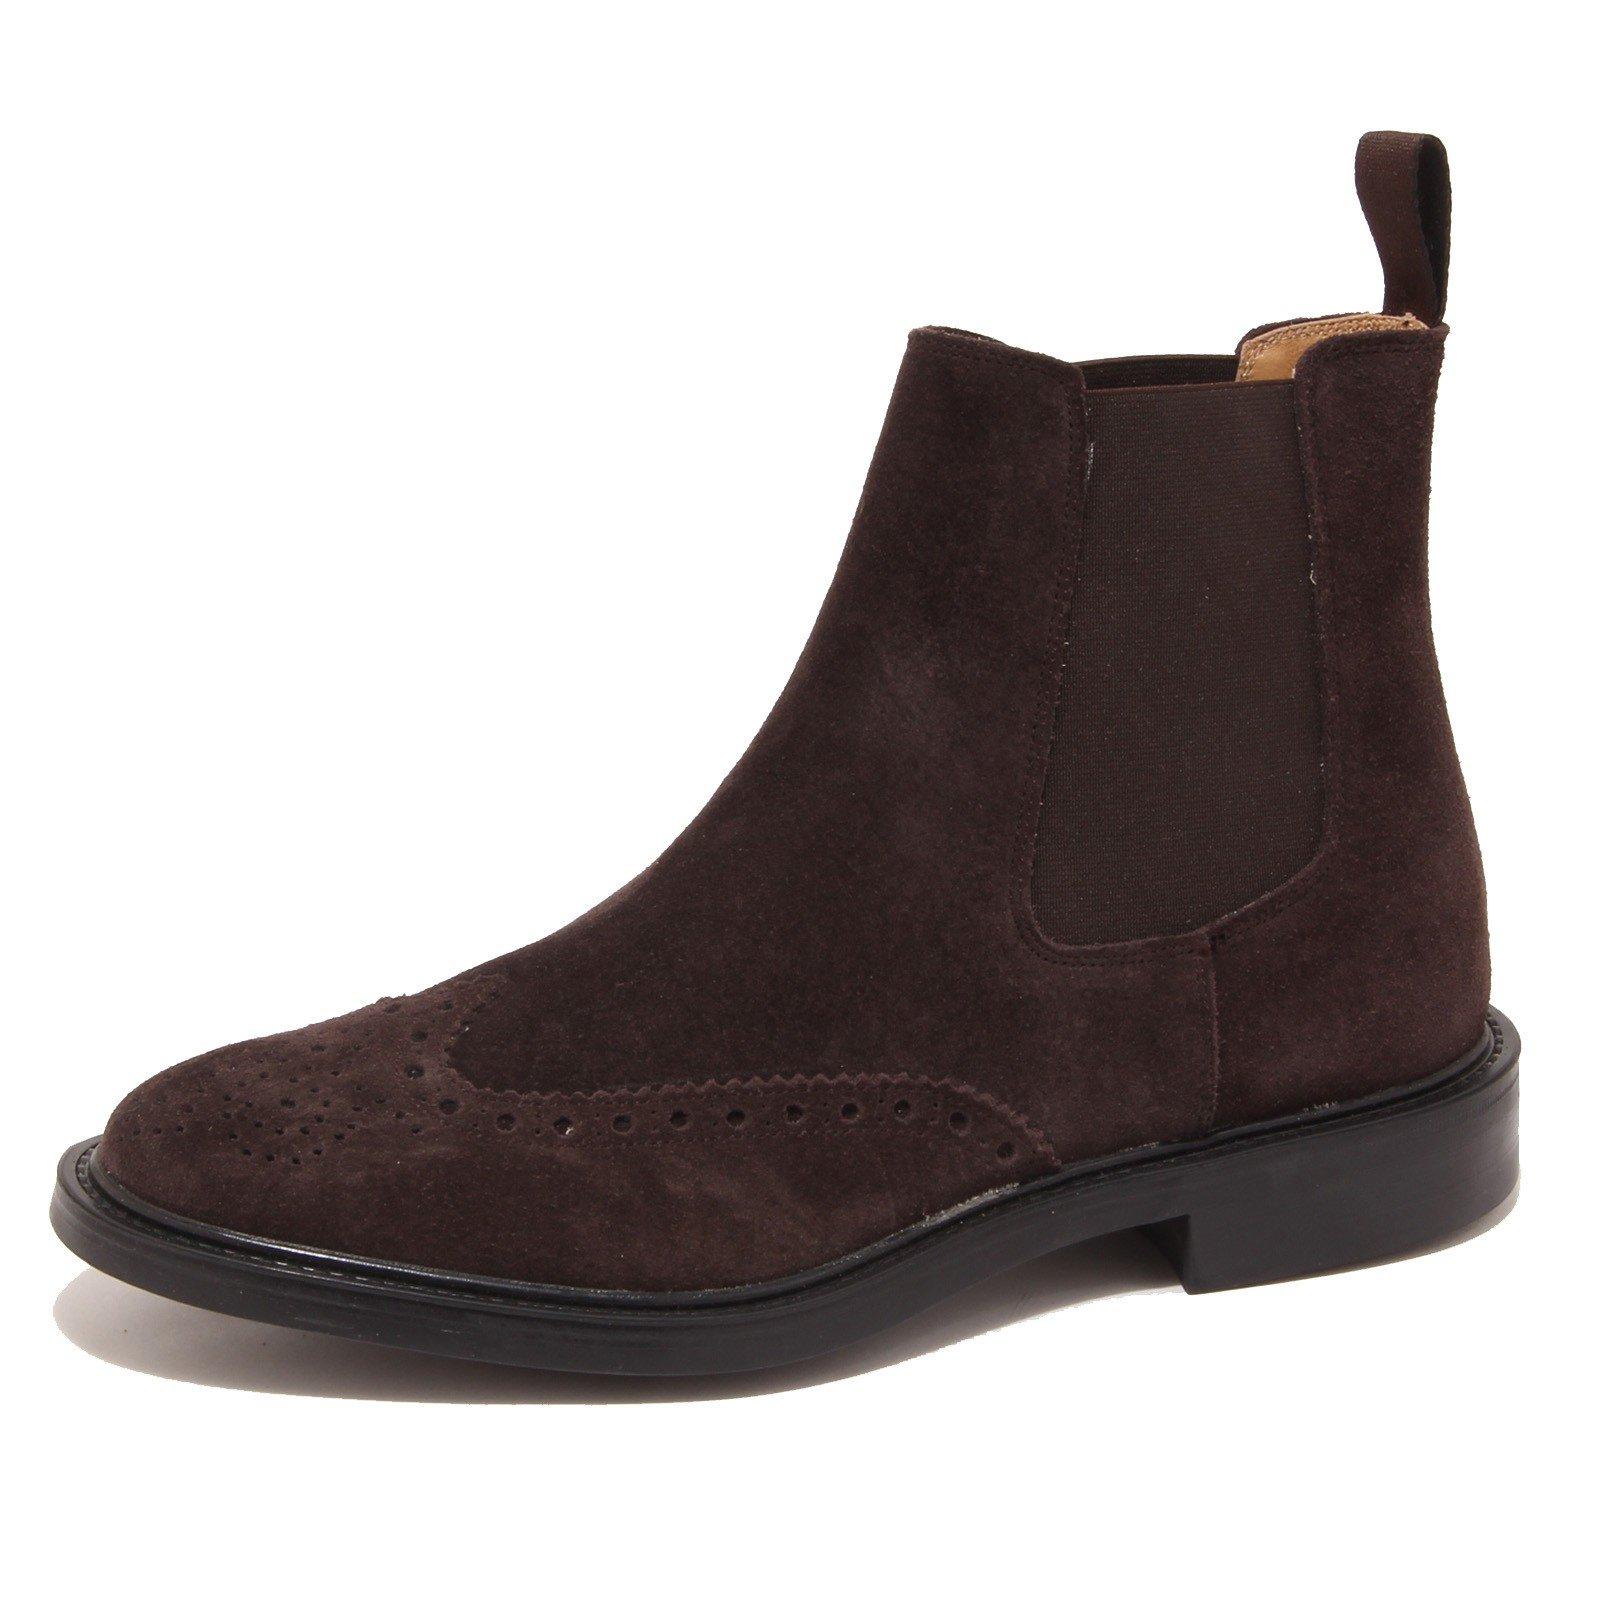 Saxone of Scotland Men's Calf Leather Chelsea Boot Brown 2321_Dark_Brown - EU40/US7